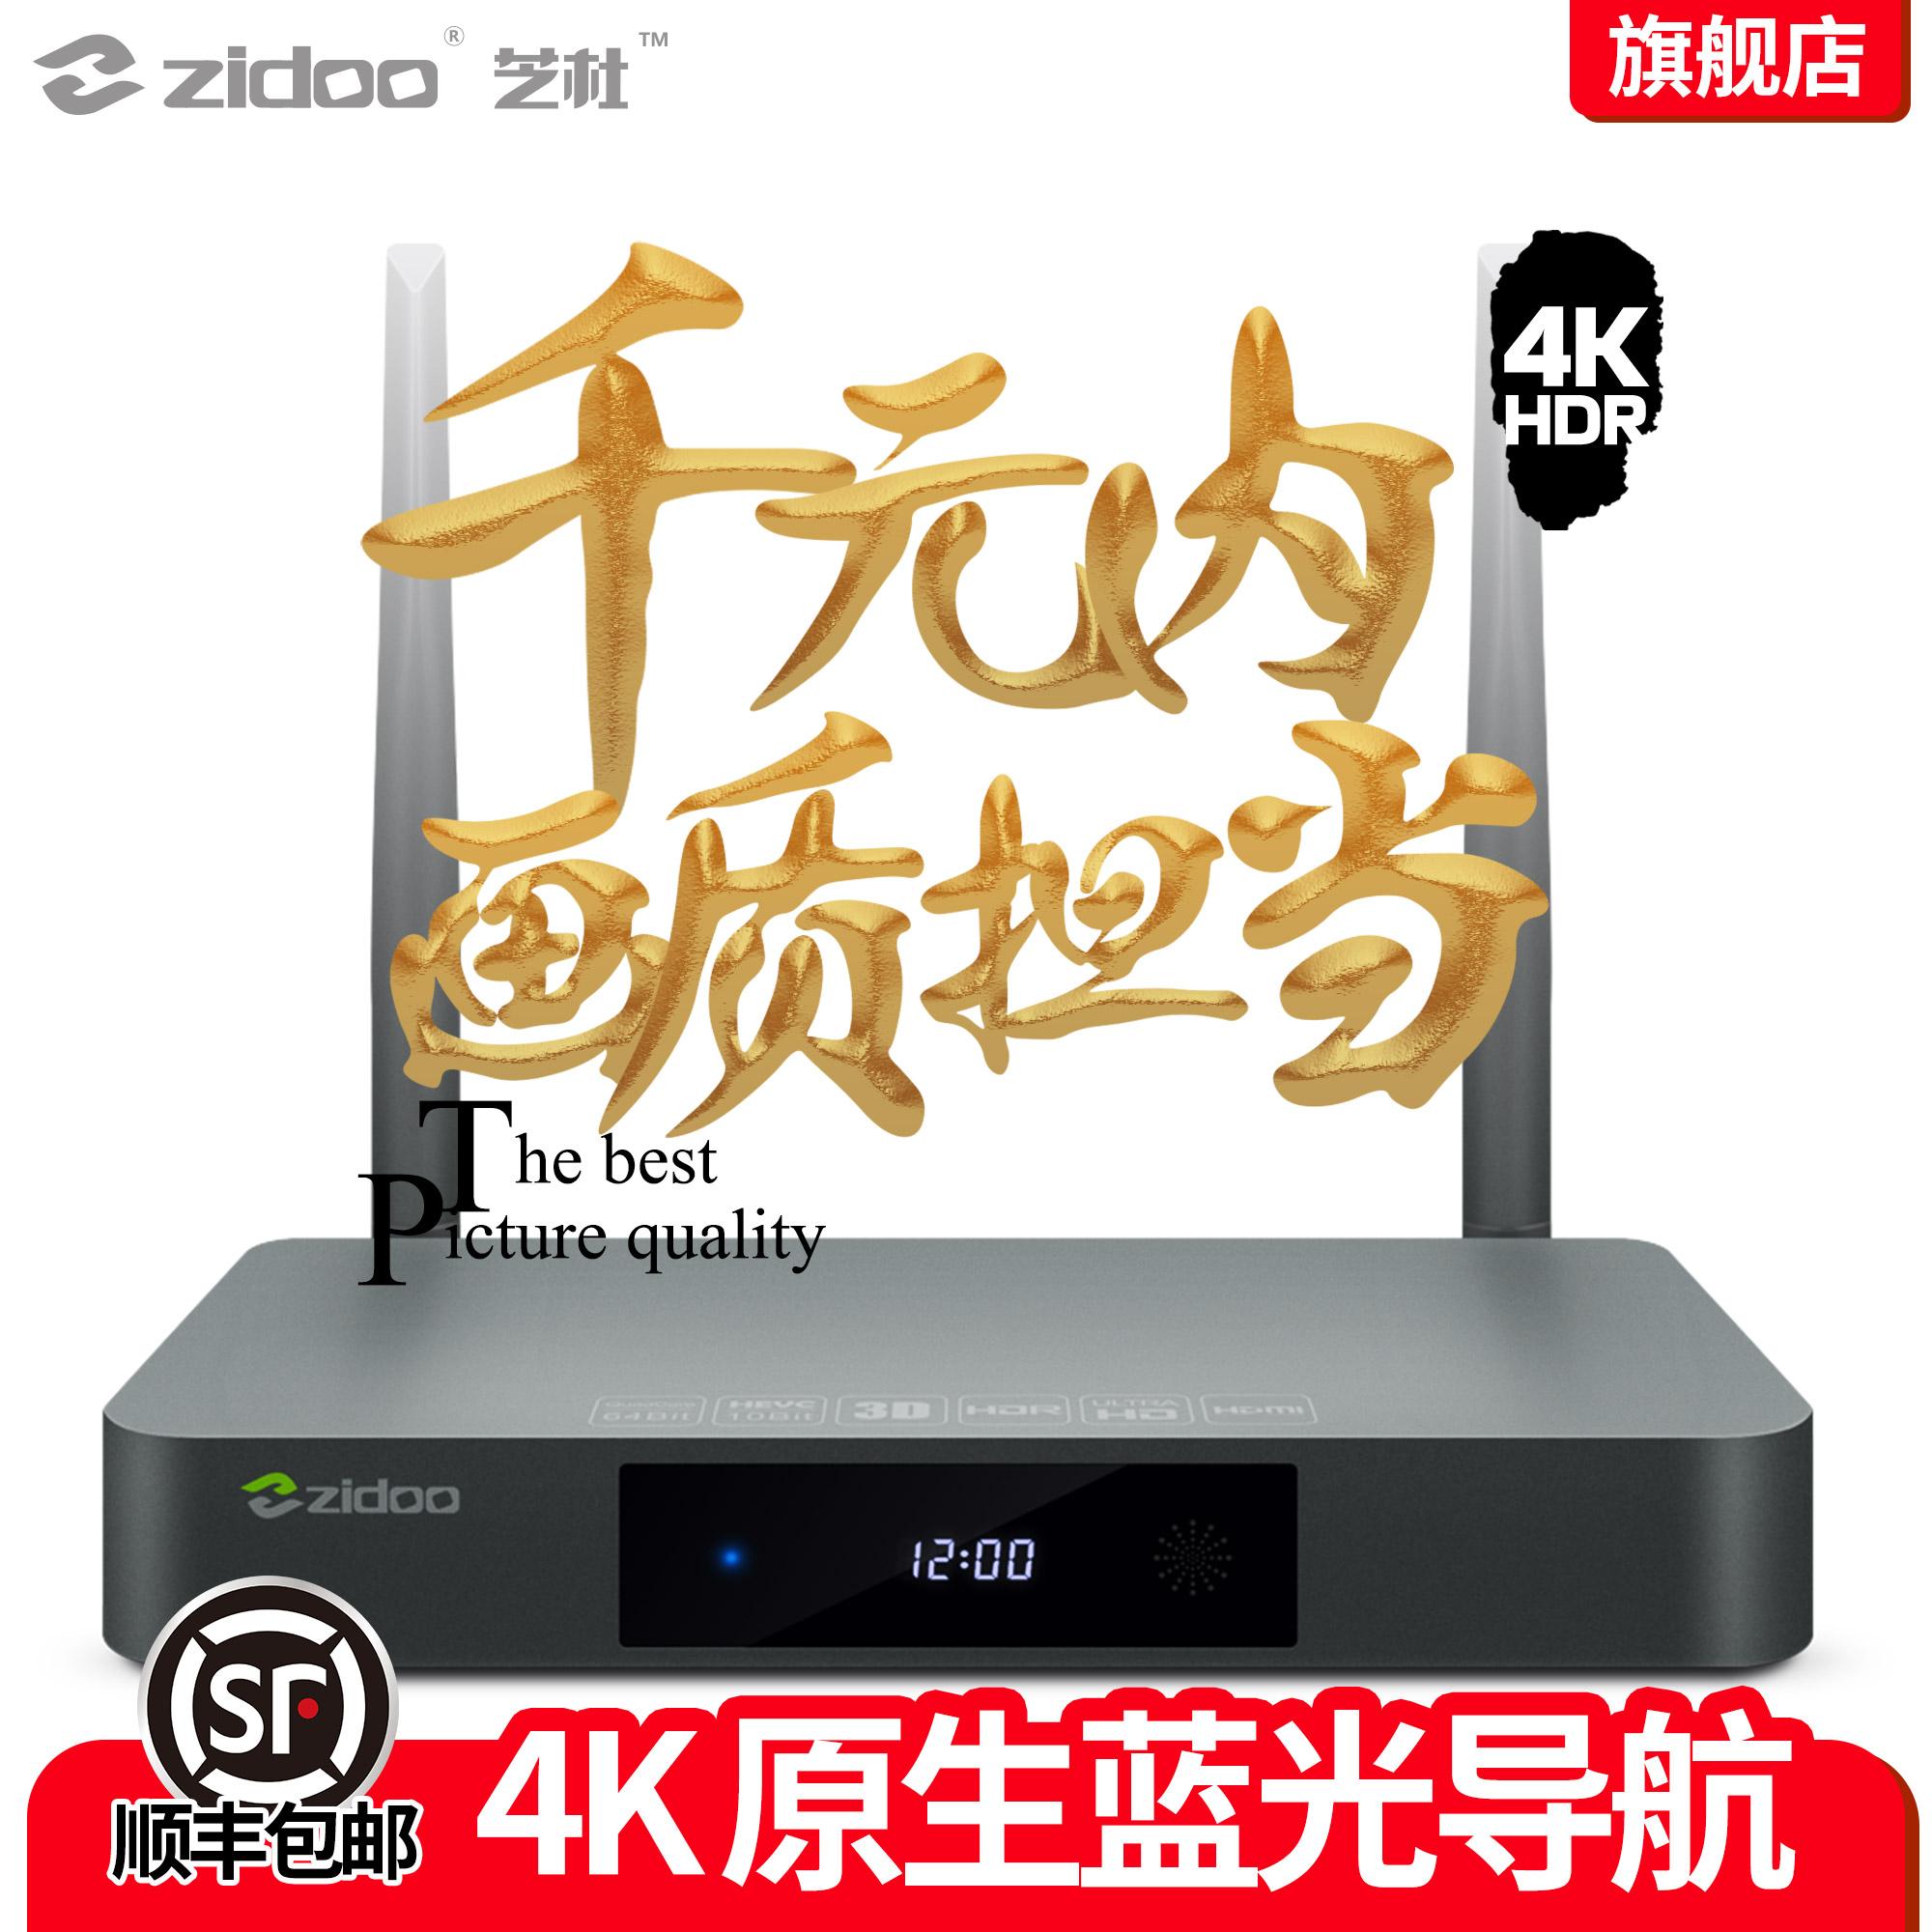 ZIDOO X9S 芝杜4K高清网络硬盘播放器蓝光播放机 HDR 机顶盒3D